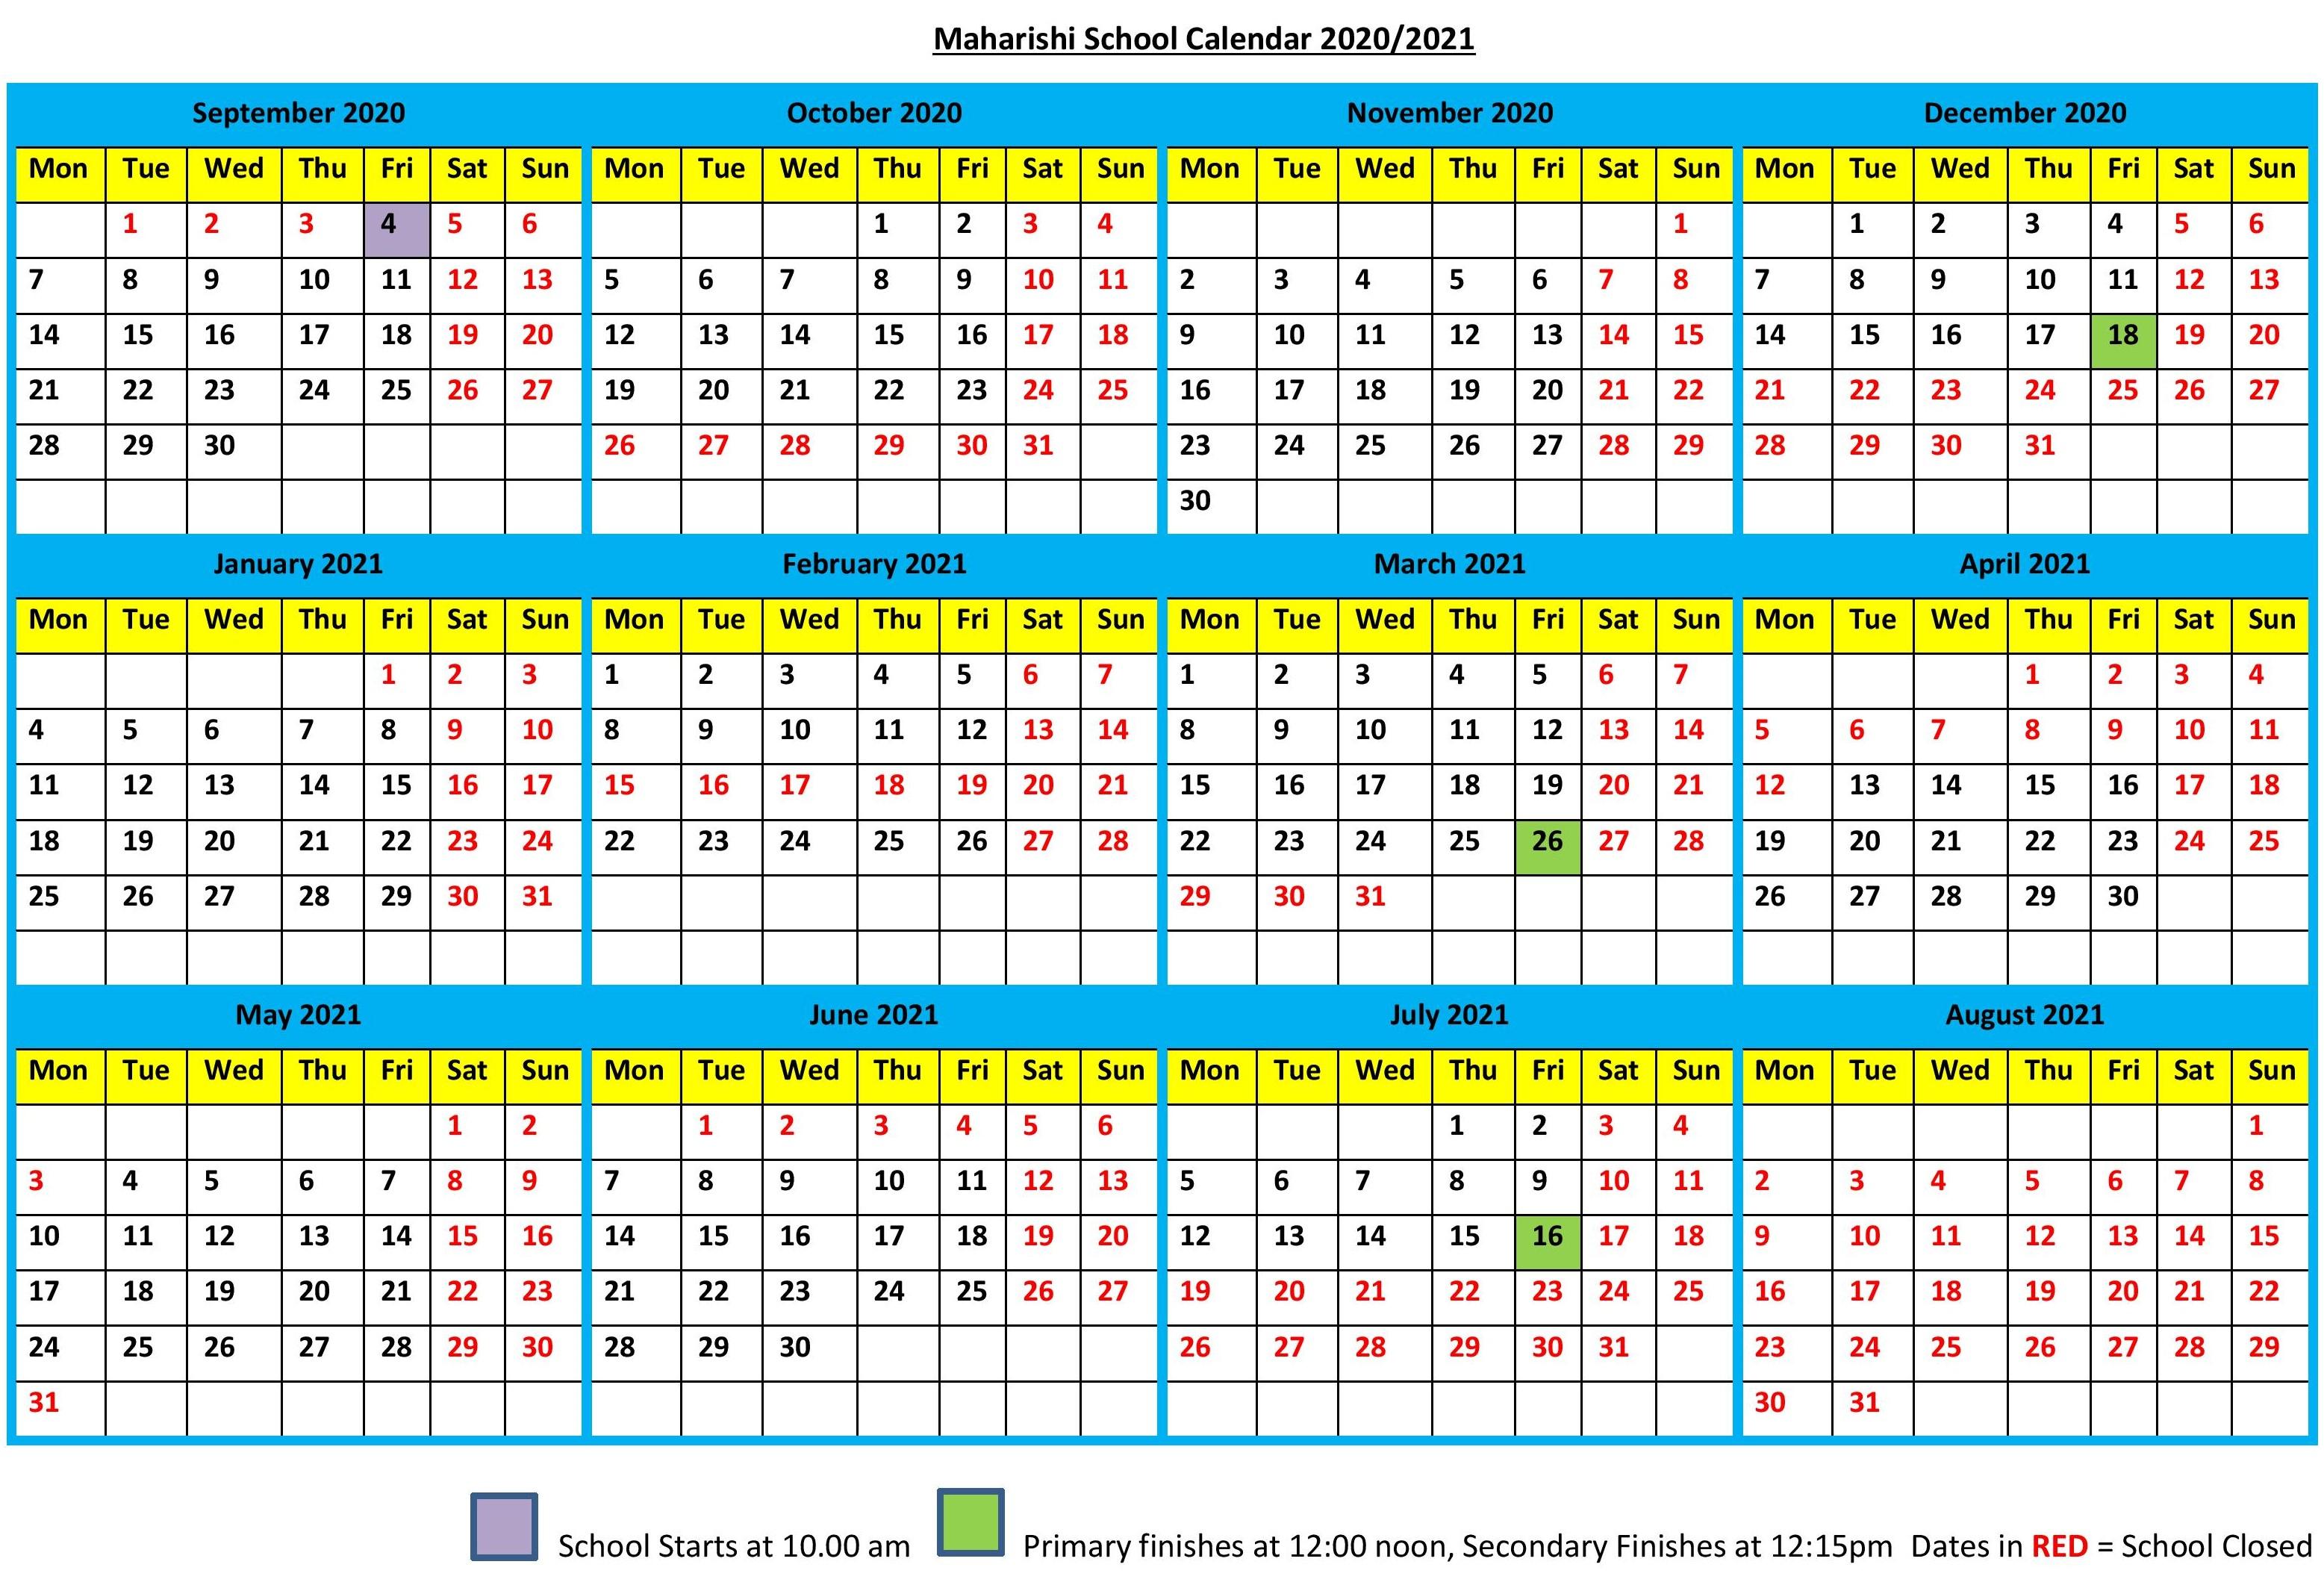 School Calendar 20202021  Maharishi School inside Maharishi School Calendar